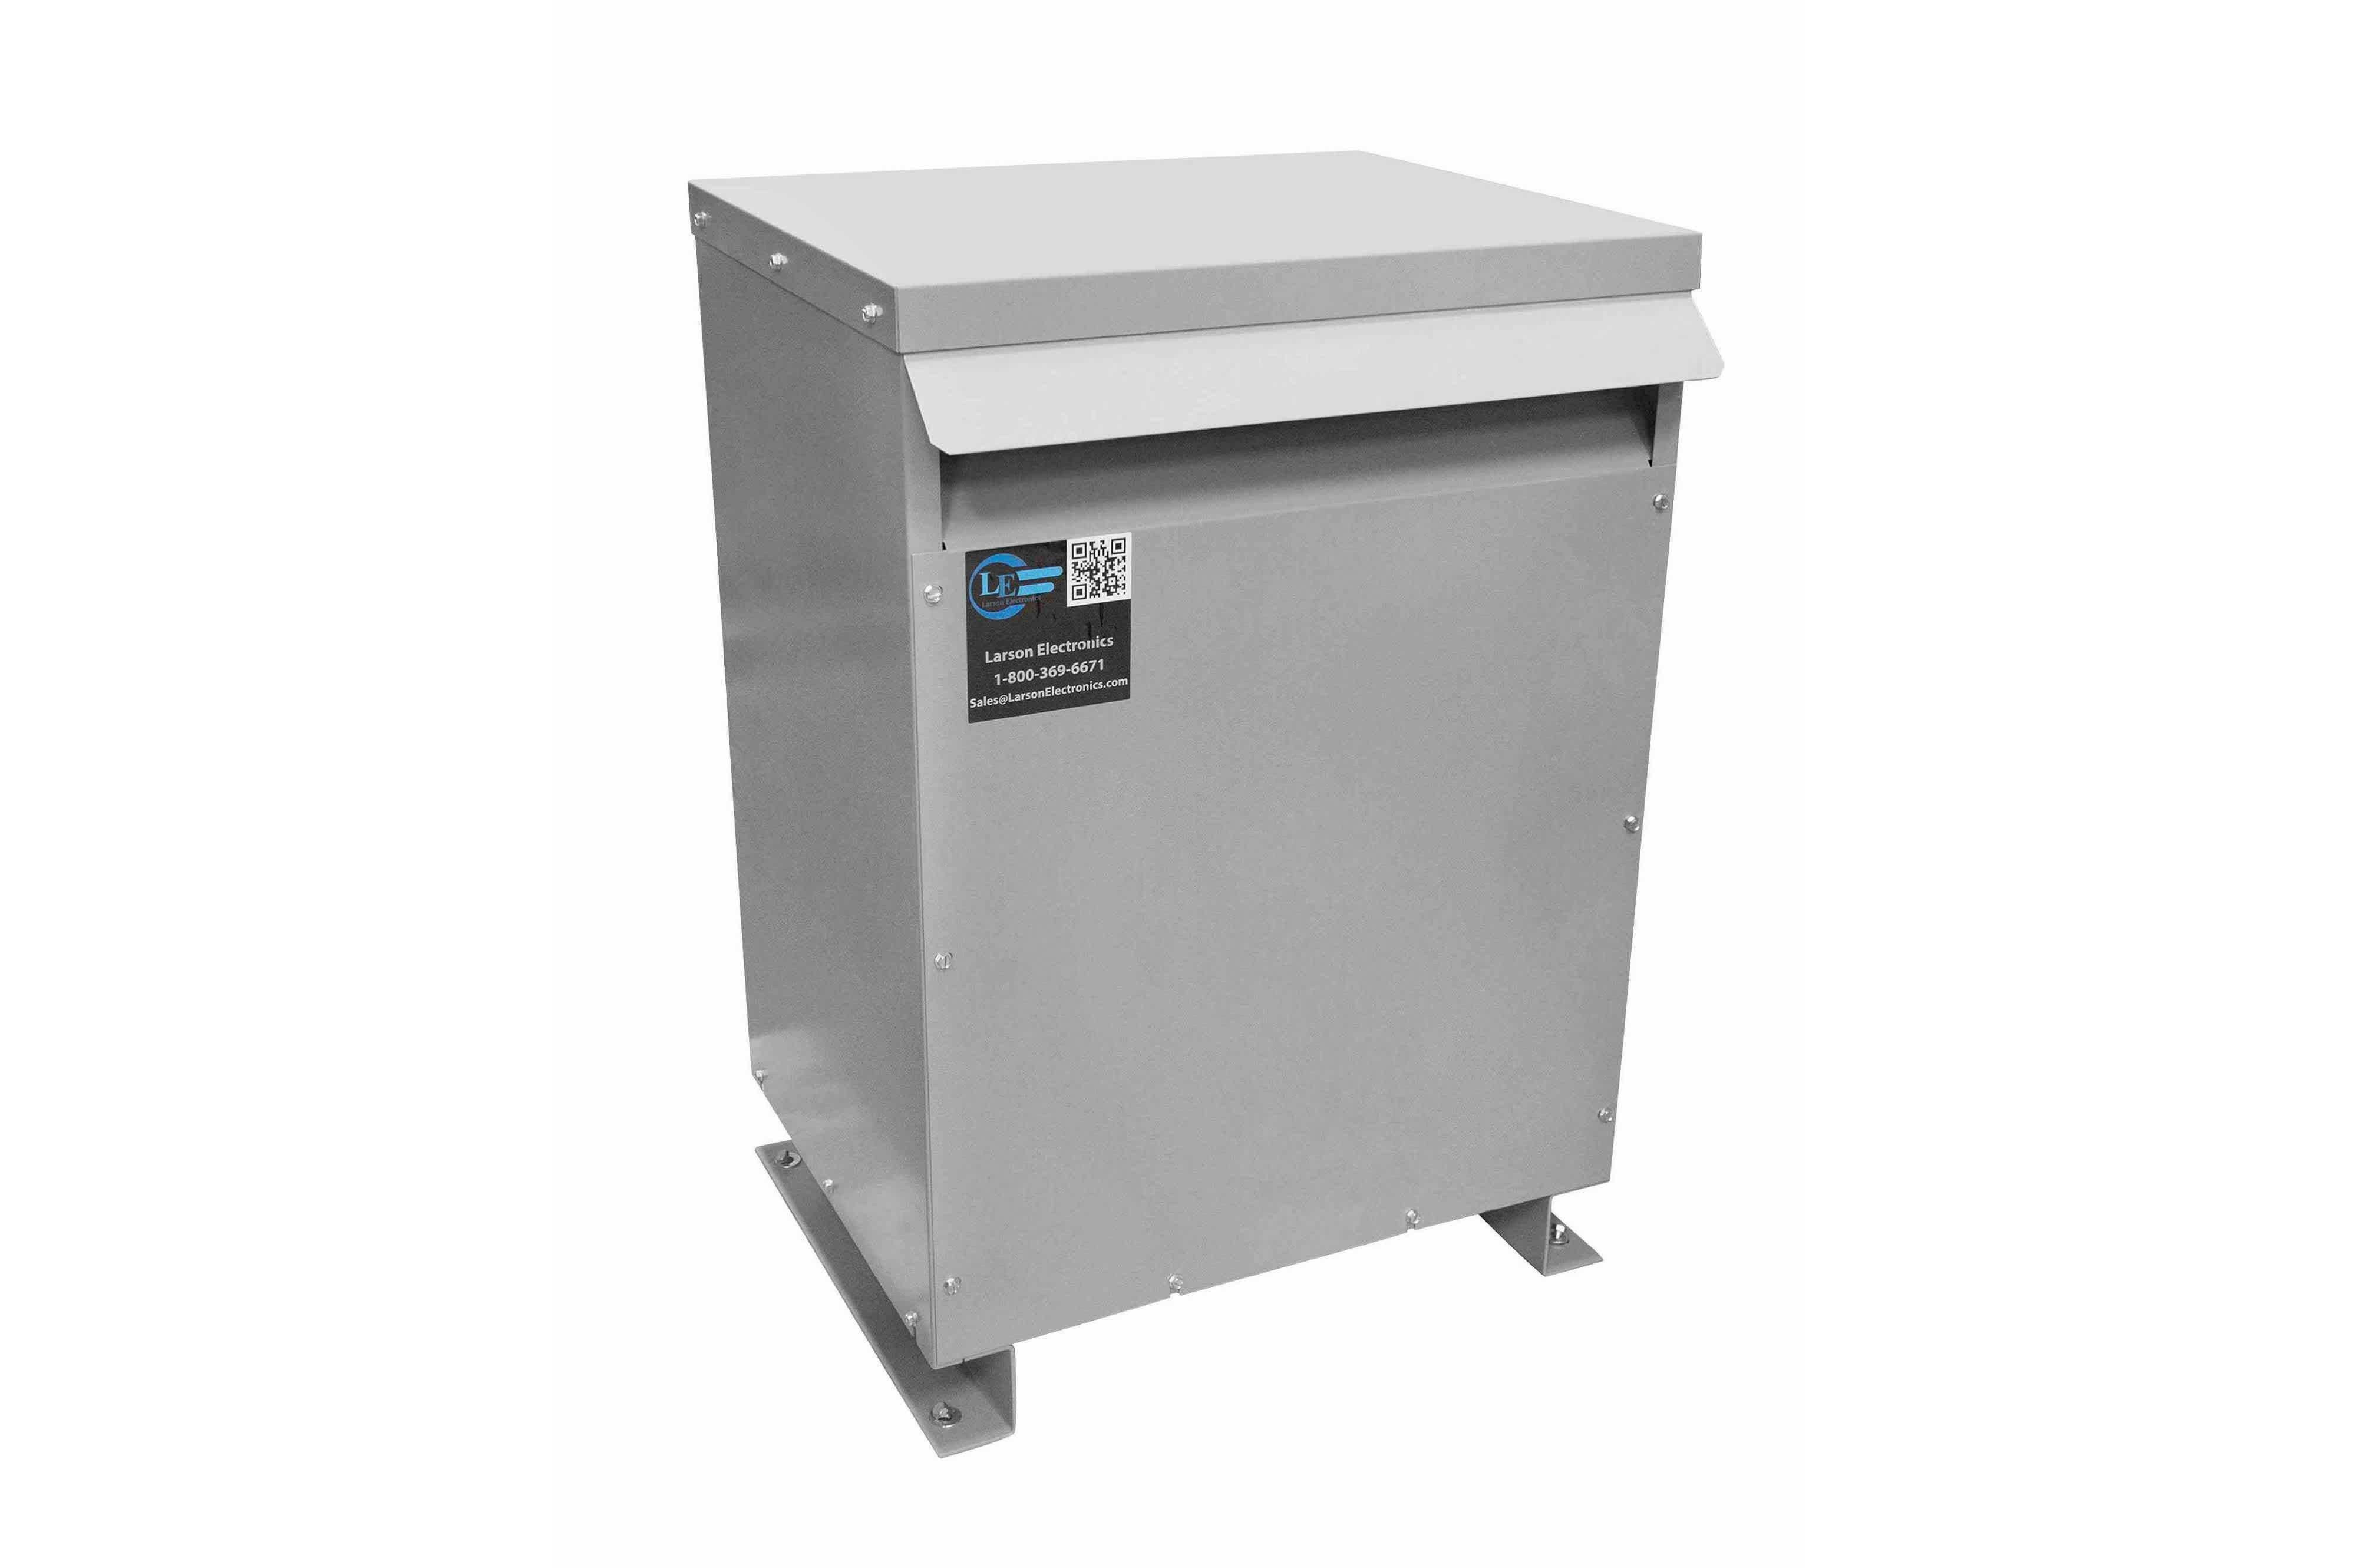 26 kVA 3PH Isolation Transformer, 460V Wye Primary, 208V Delta Secondary, N3R, Ventilated, 60 Hz